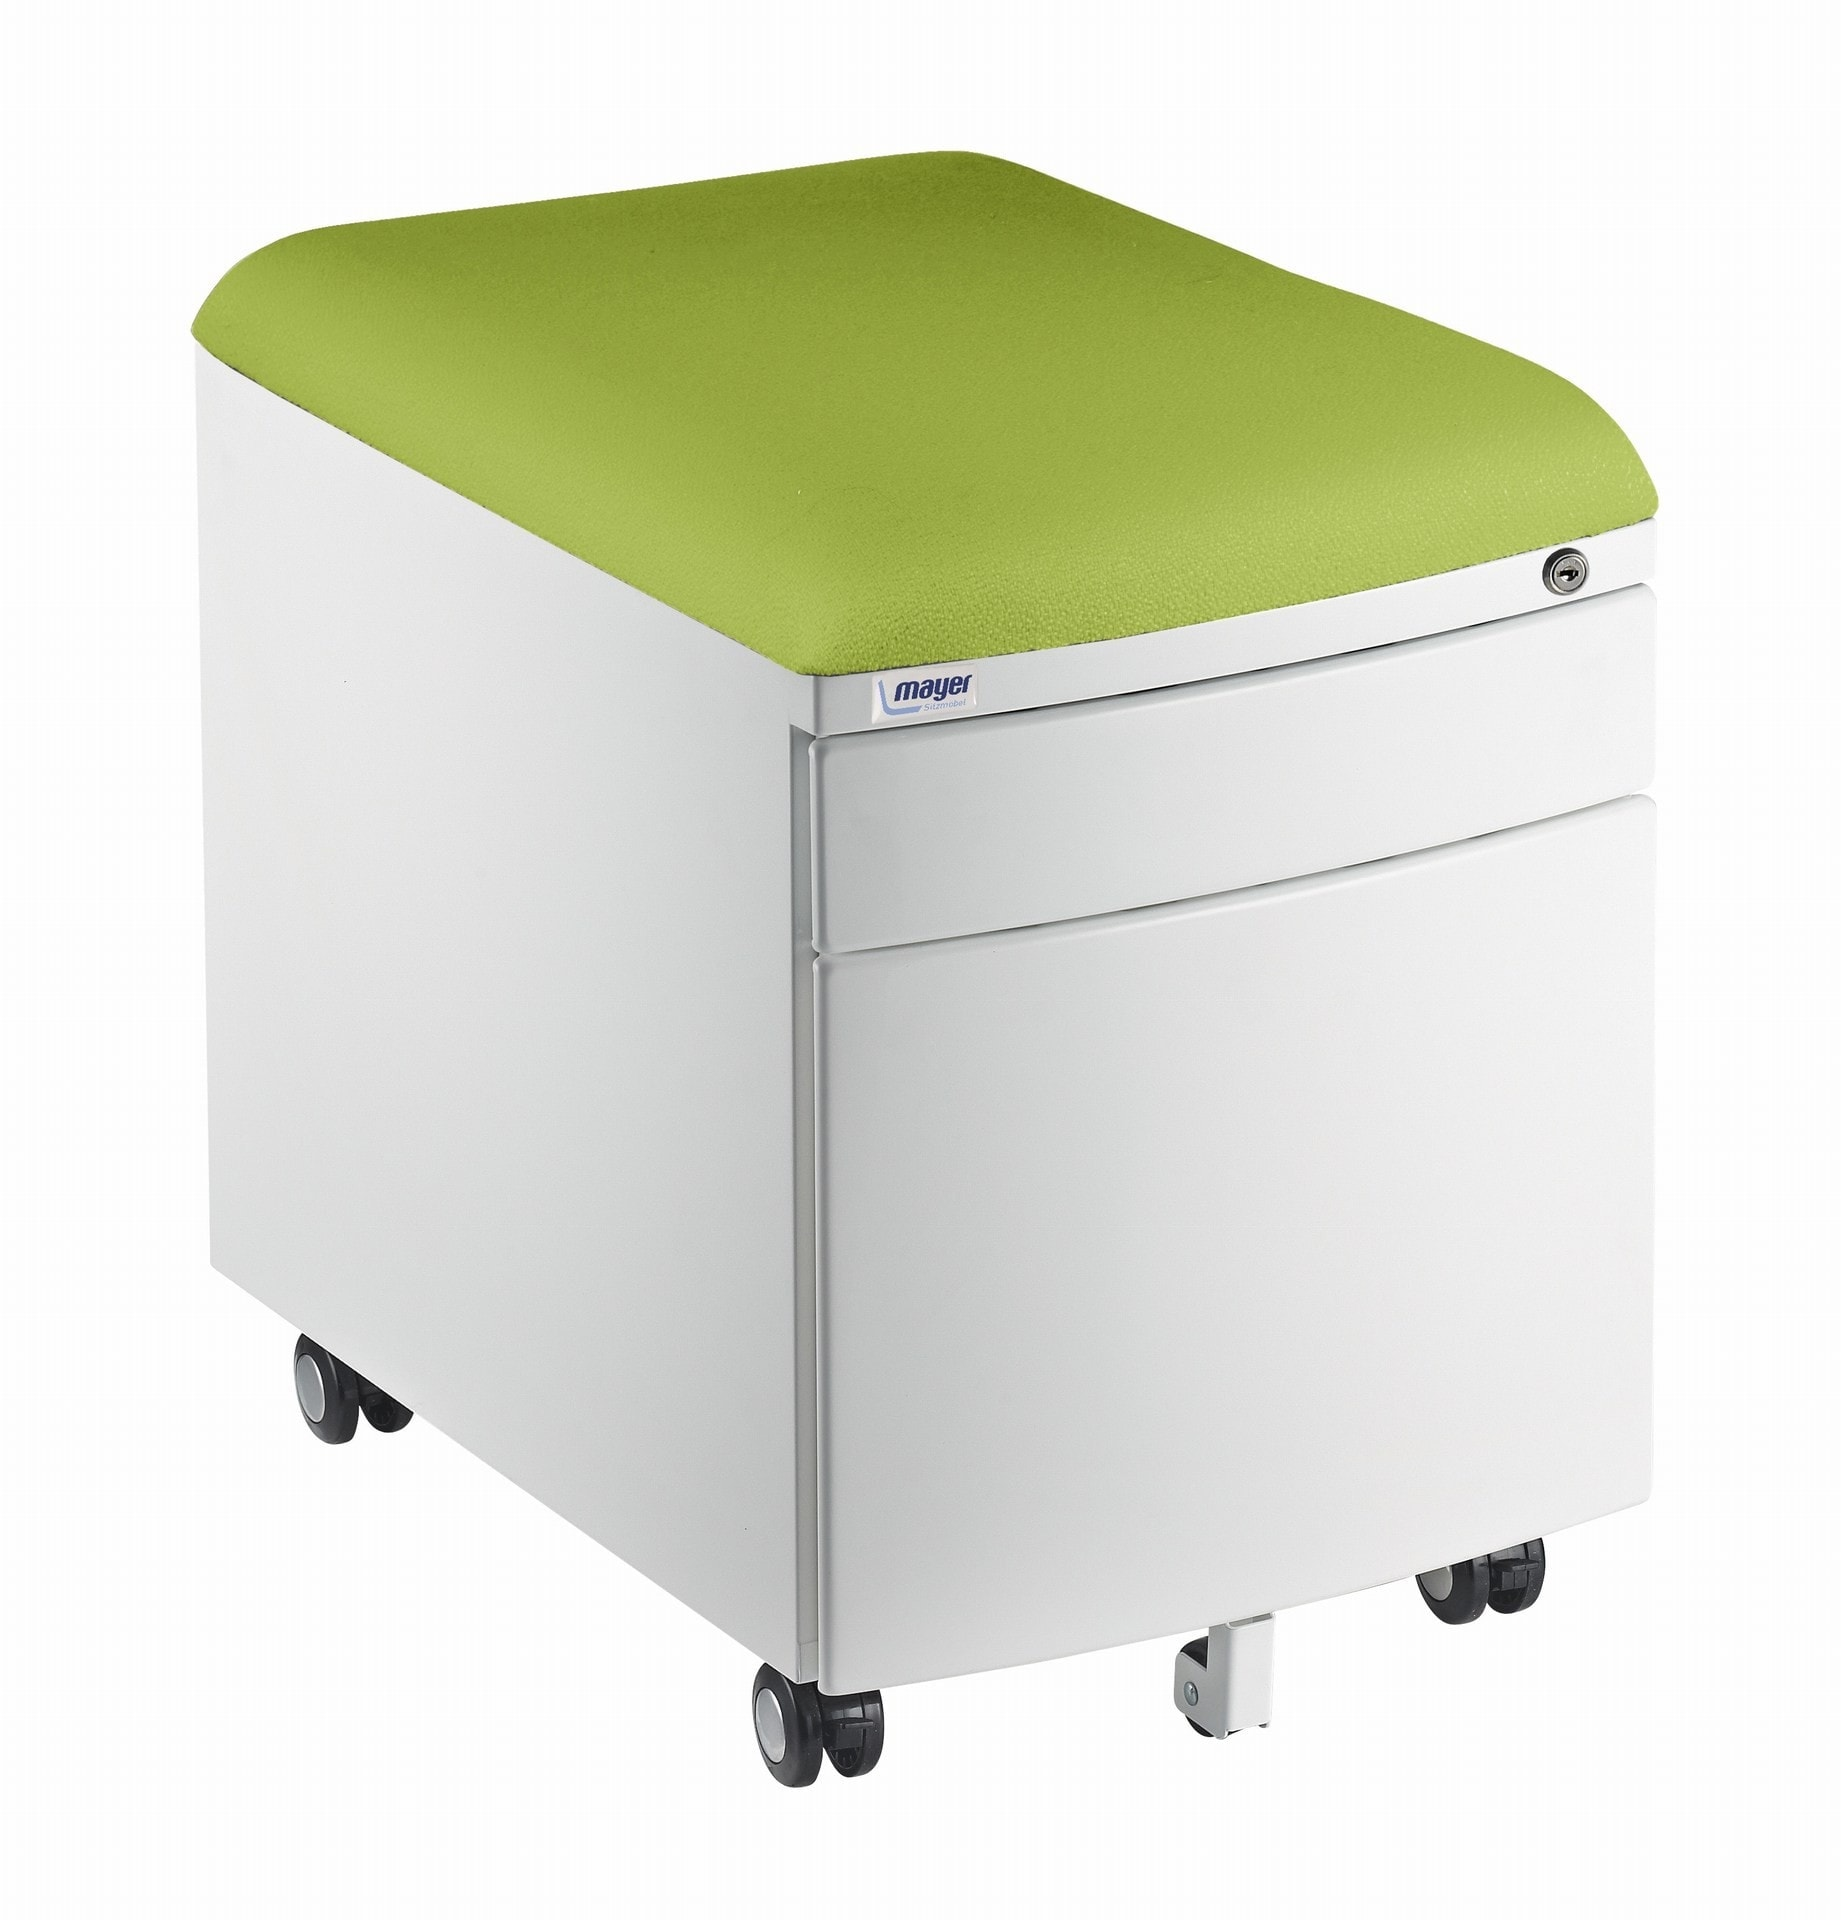 Kontejner Mayer bílý - potah aquaclean zelený